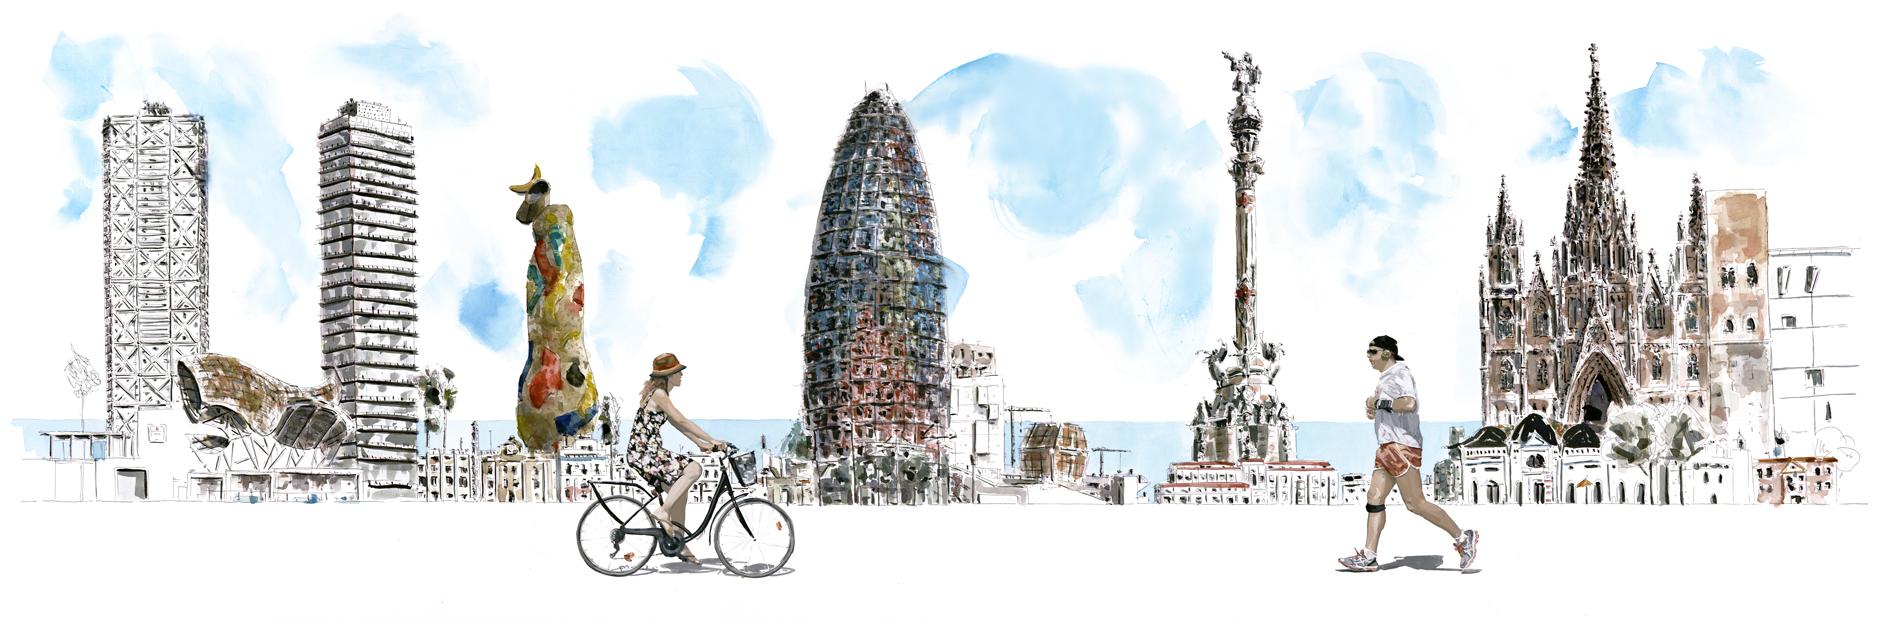 barcelonink-skyline-barcelona-v5-xavi-julia (1)